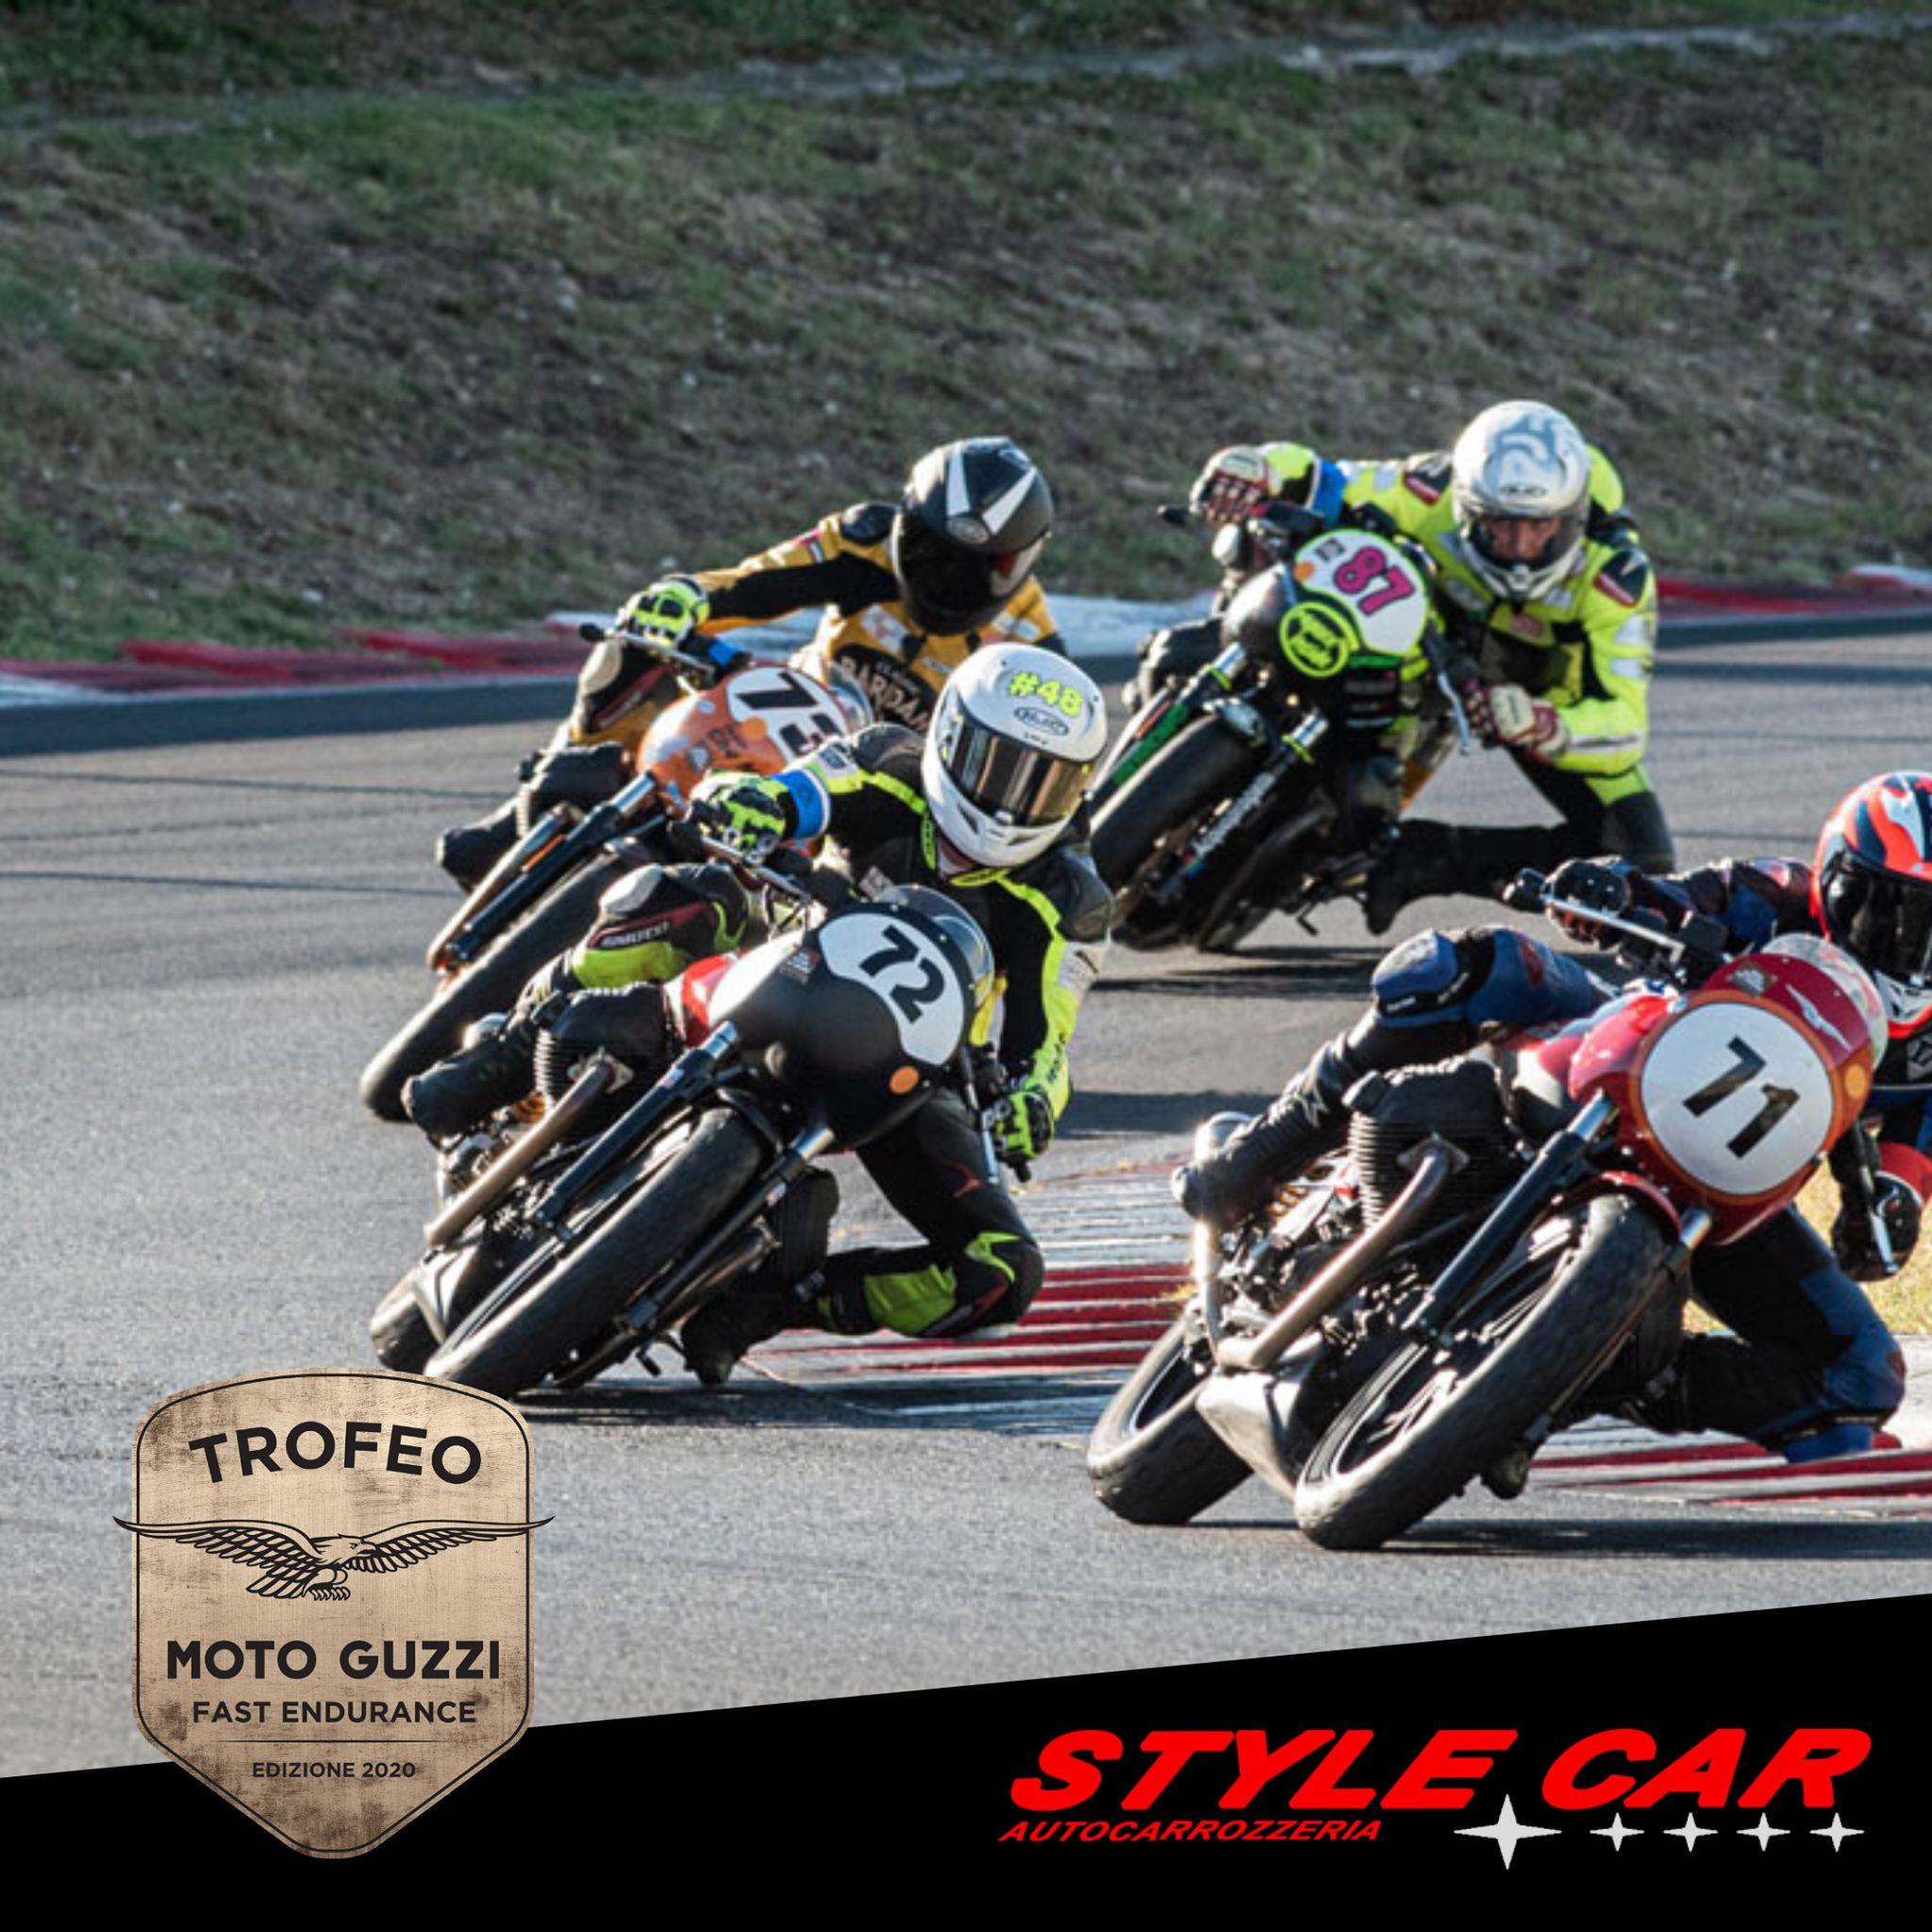 stylecar-motoguzzi-luglio2